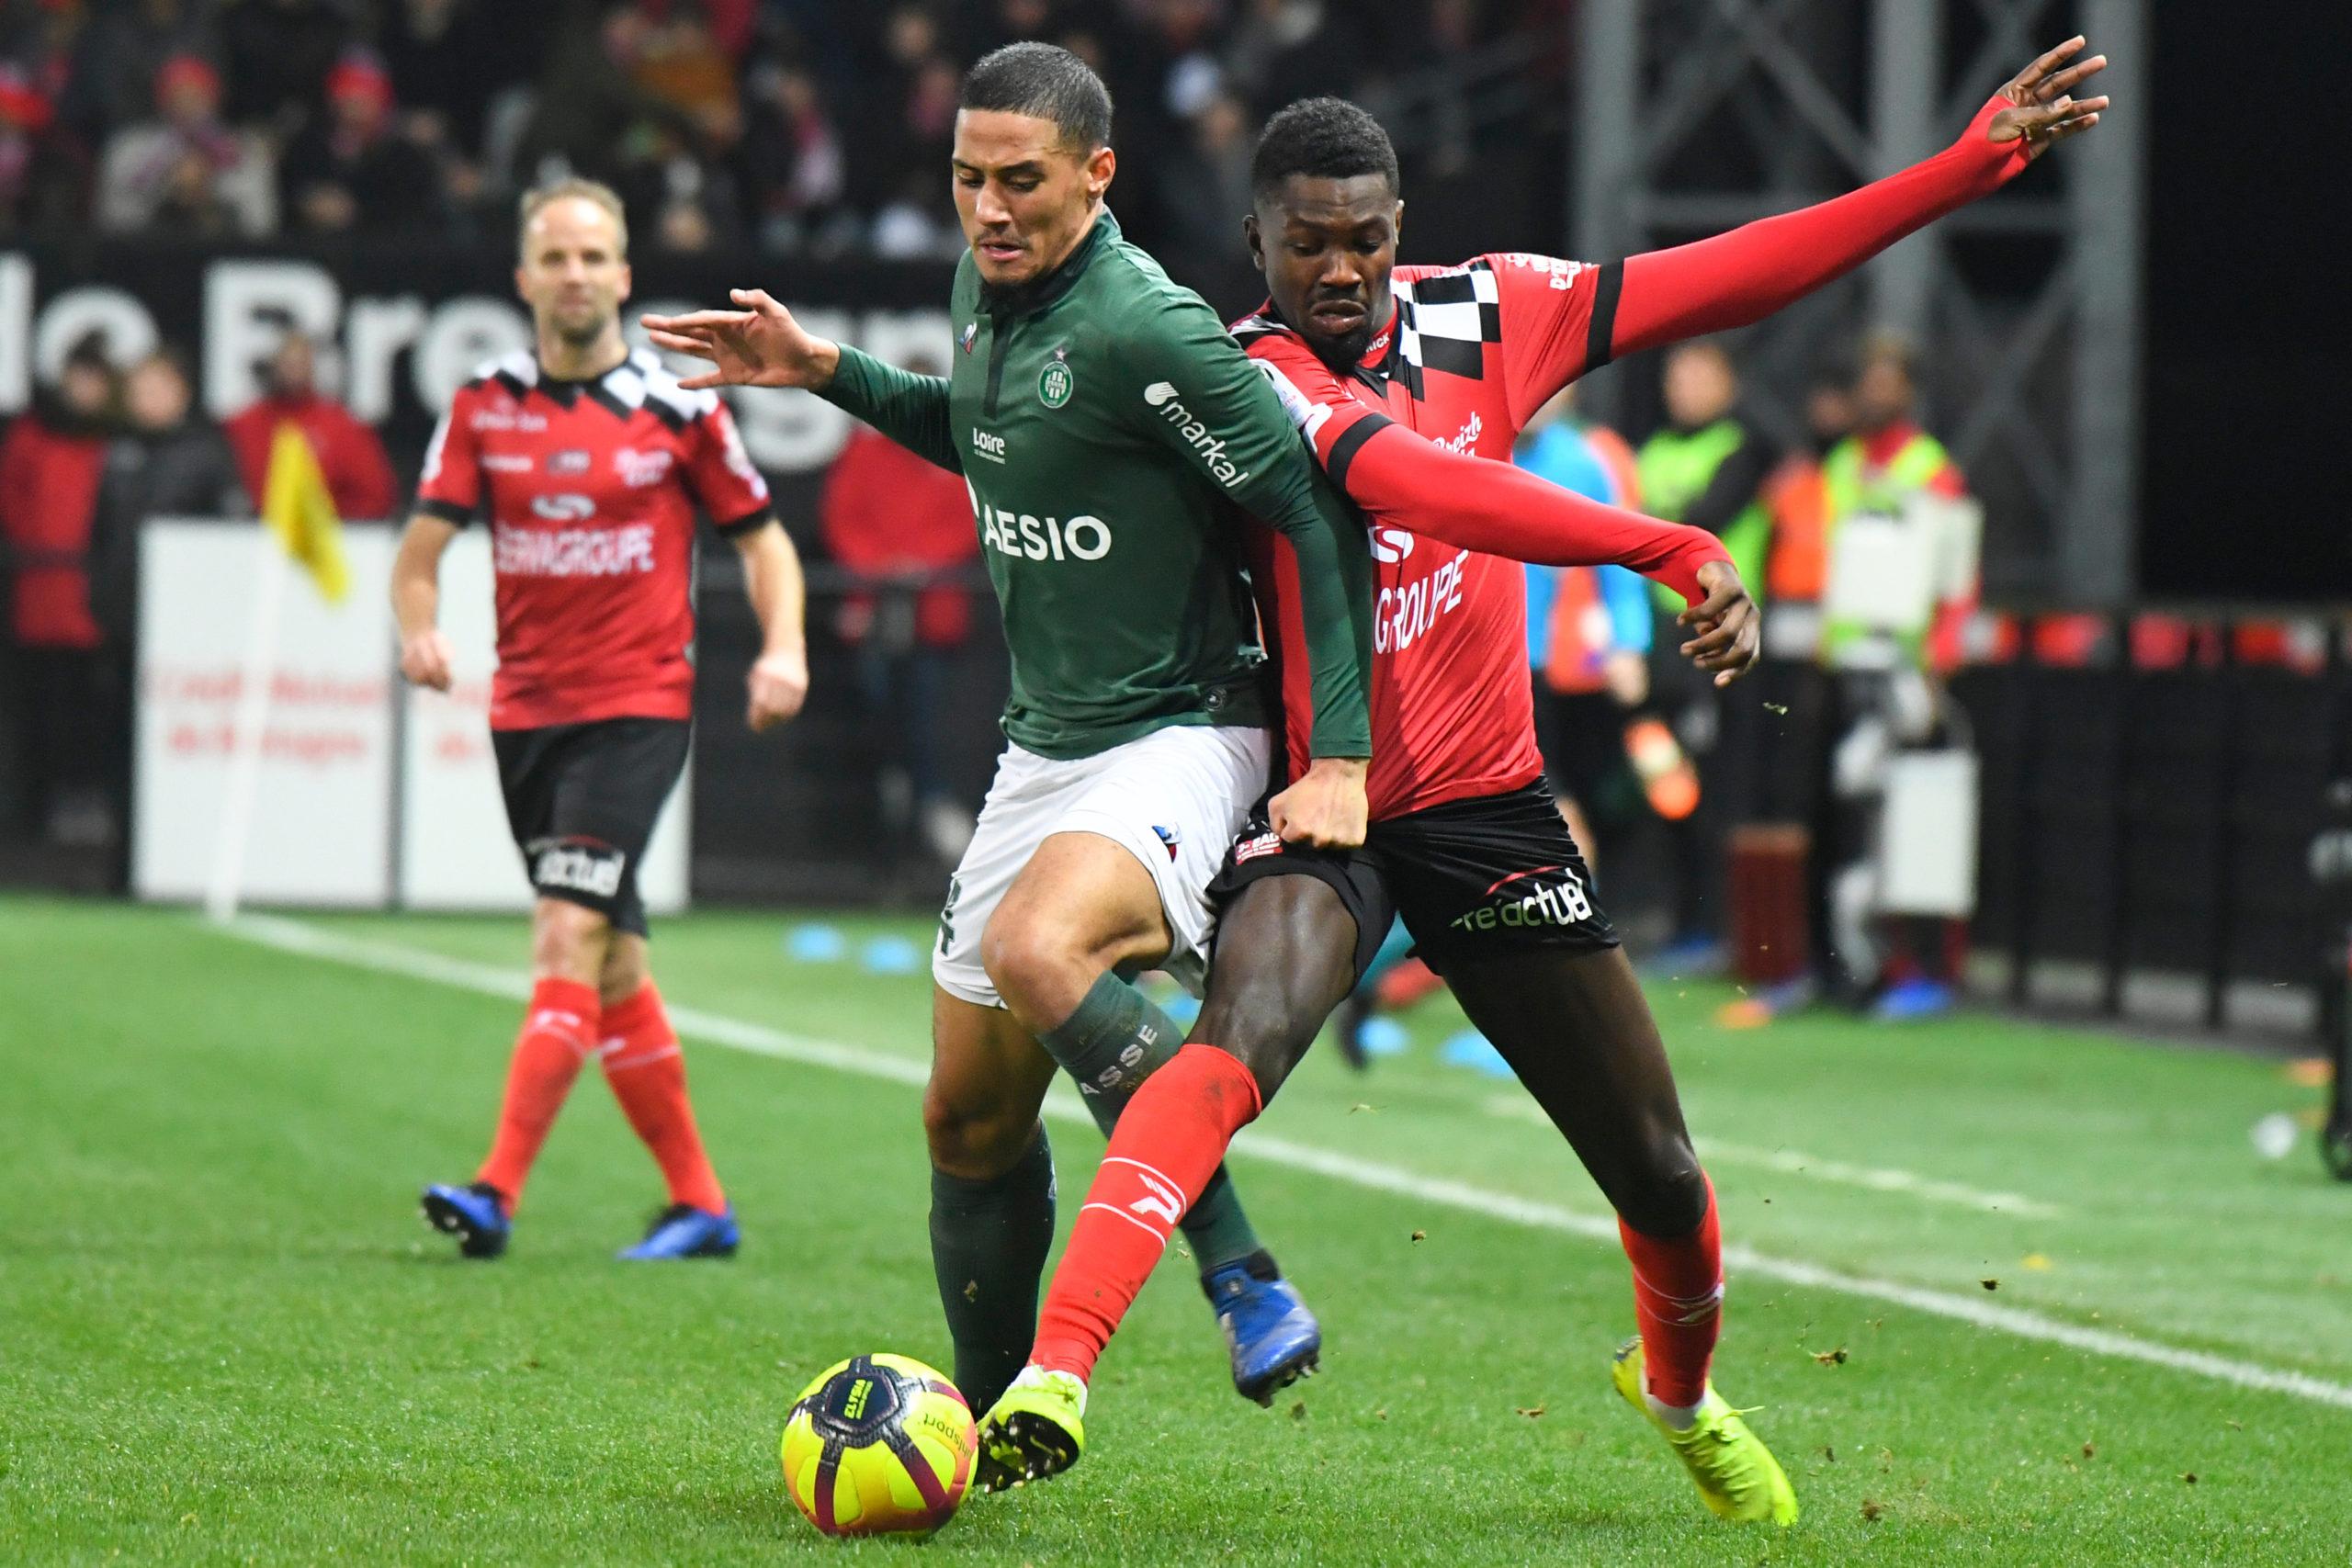 Saliba playing for Saint-Étienne against Guingamp EAG